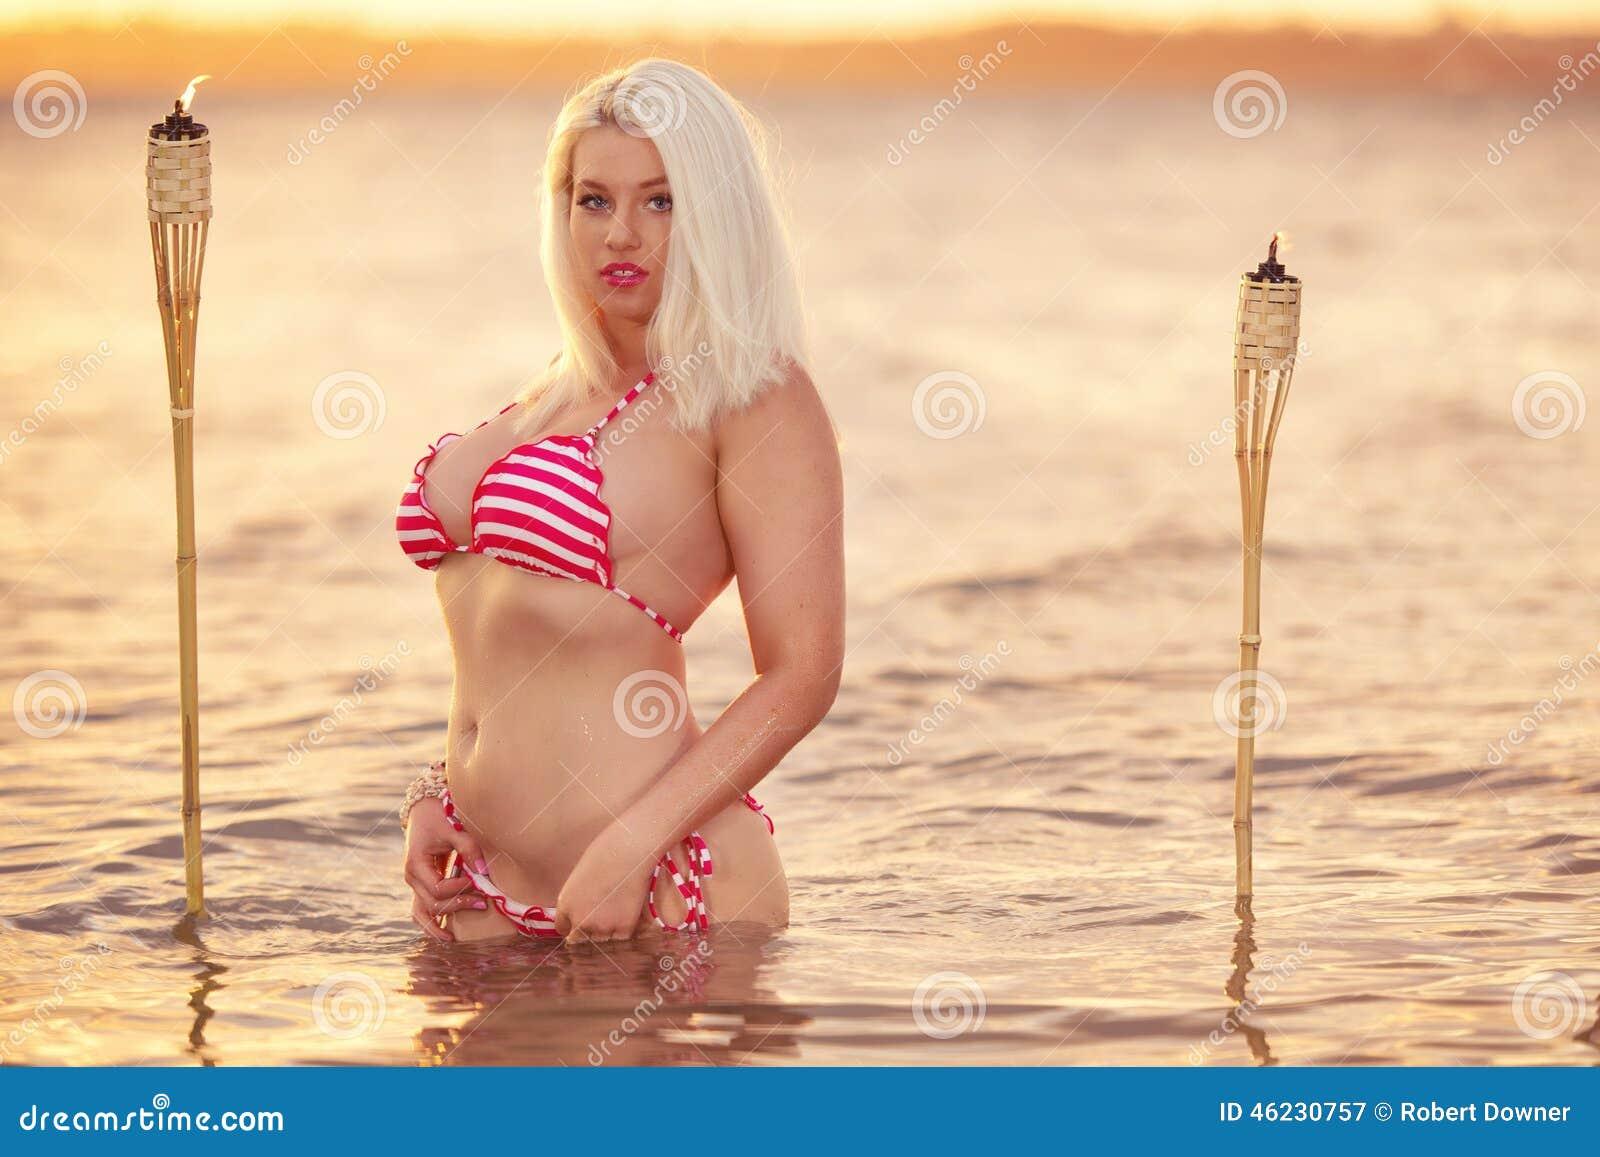 cdde833cf1 Beautiful blonde woman posing in a bikini on the beach at sunset in  Brisbane